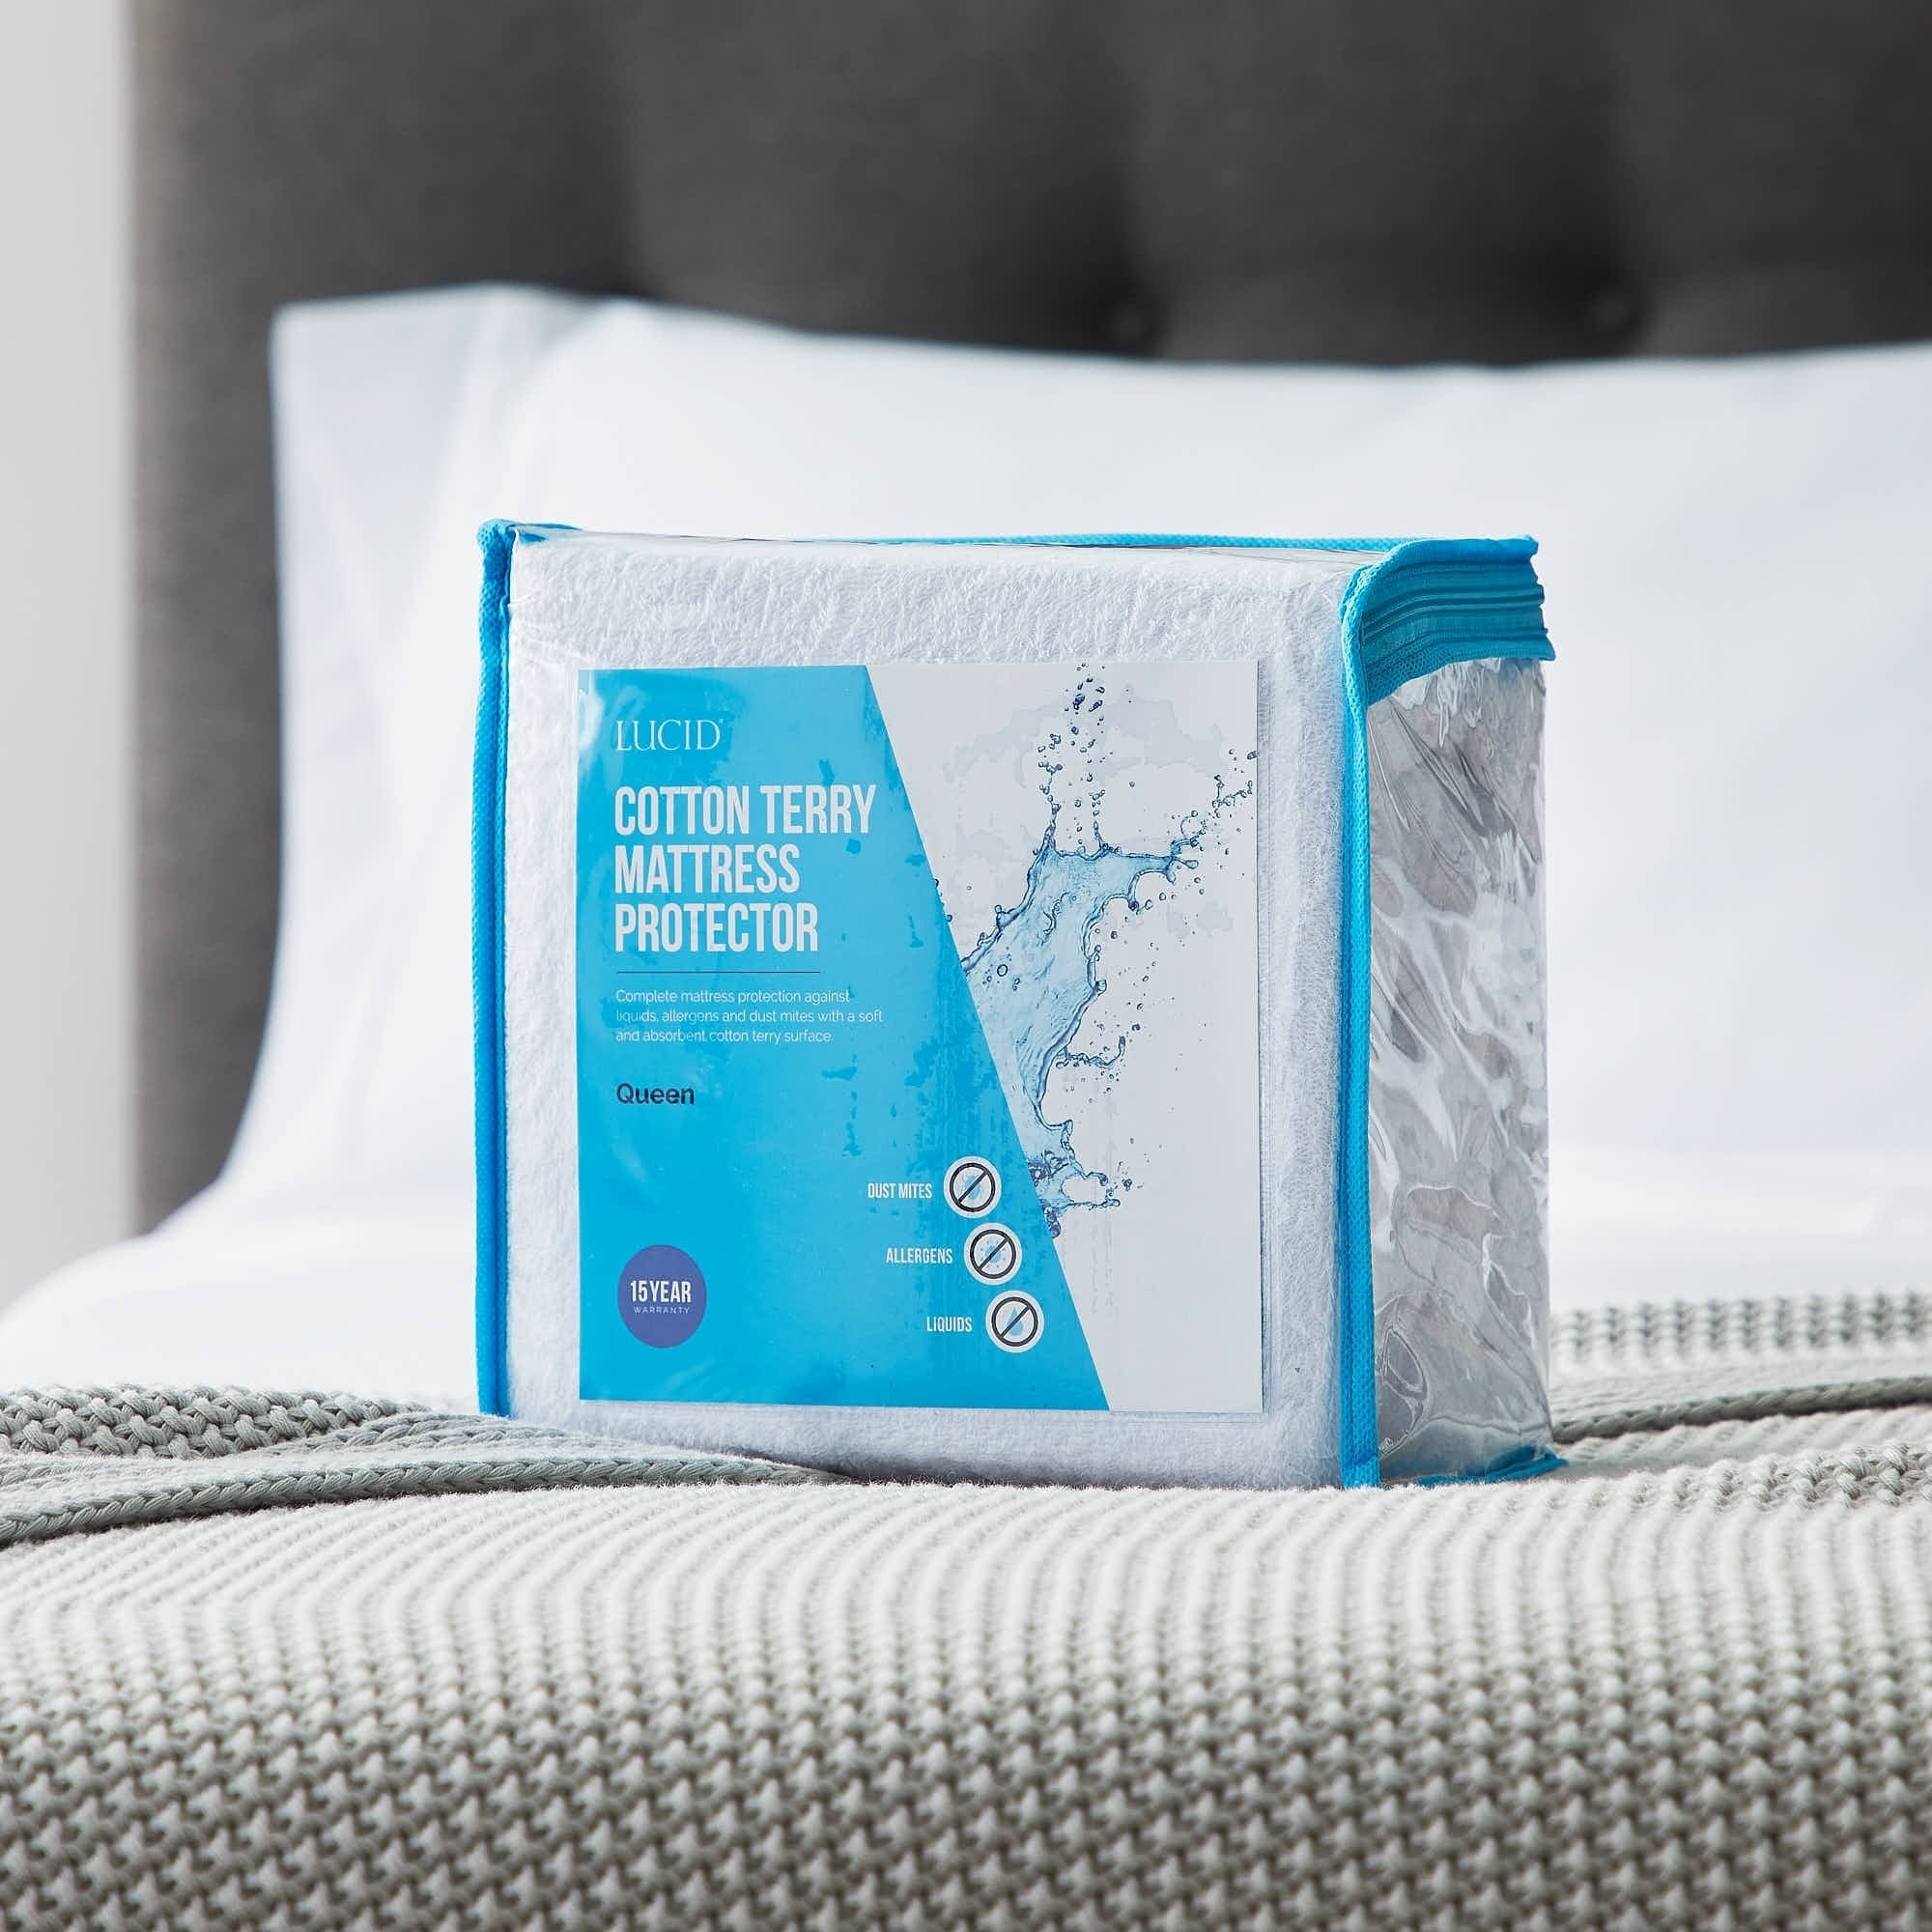 Premium Cotton Terry Matress Protector Waterproof Hypoallergenic Mattress Cover